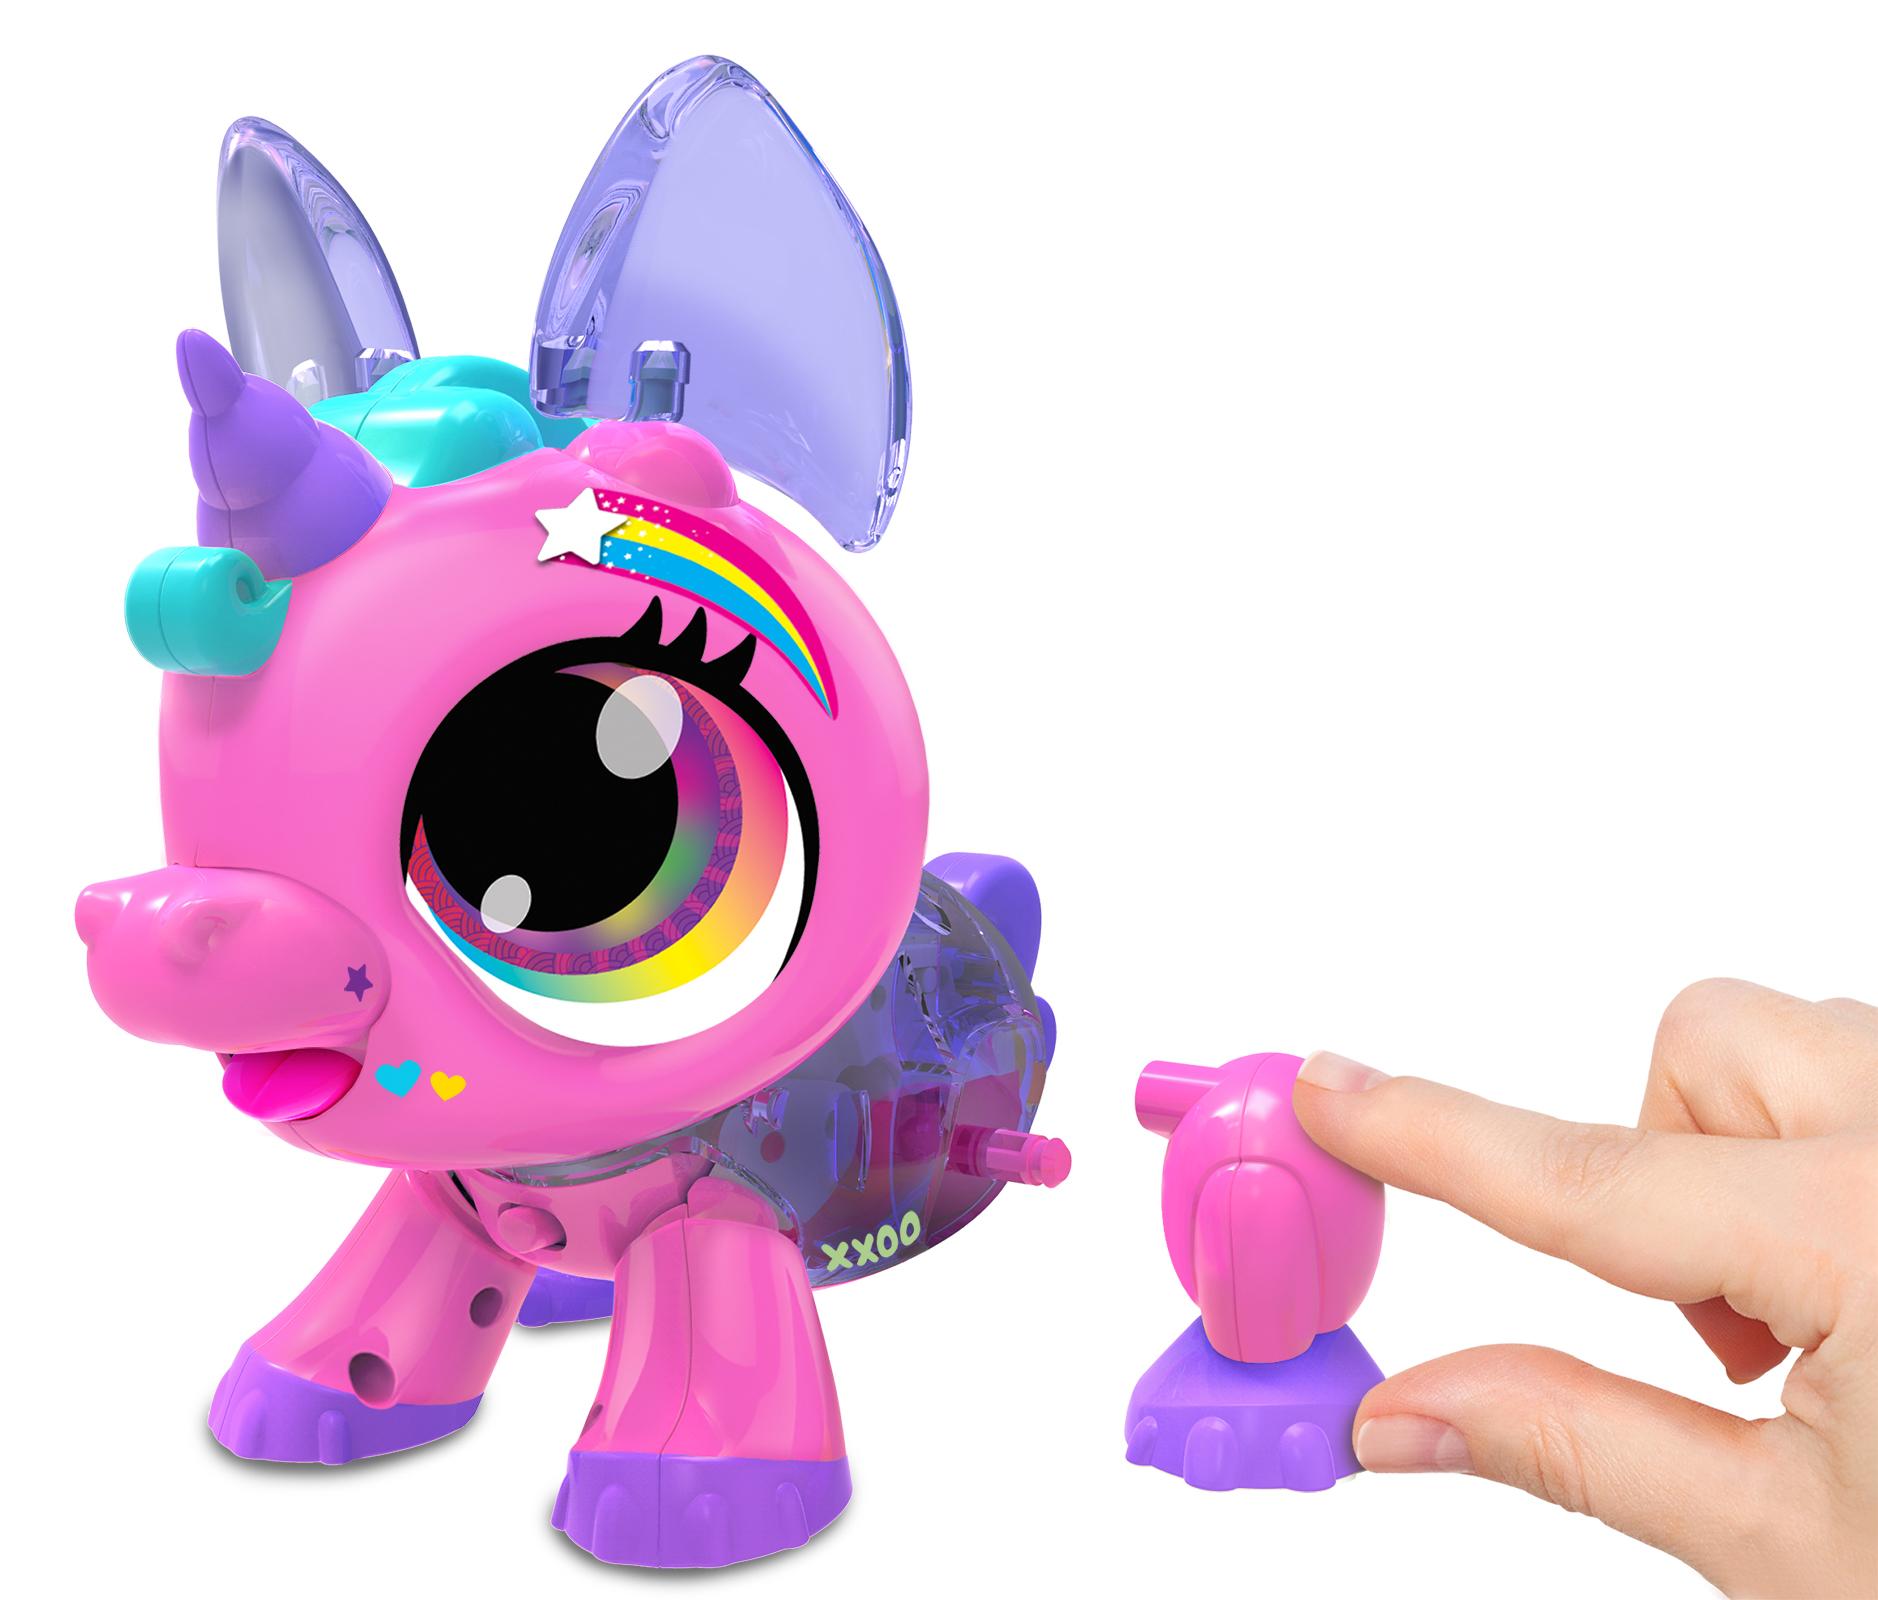 Image 1 Unicorn - Hero with Hand - hi-res.jpg